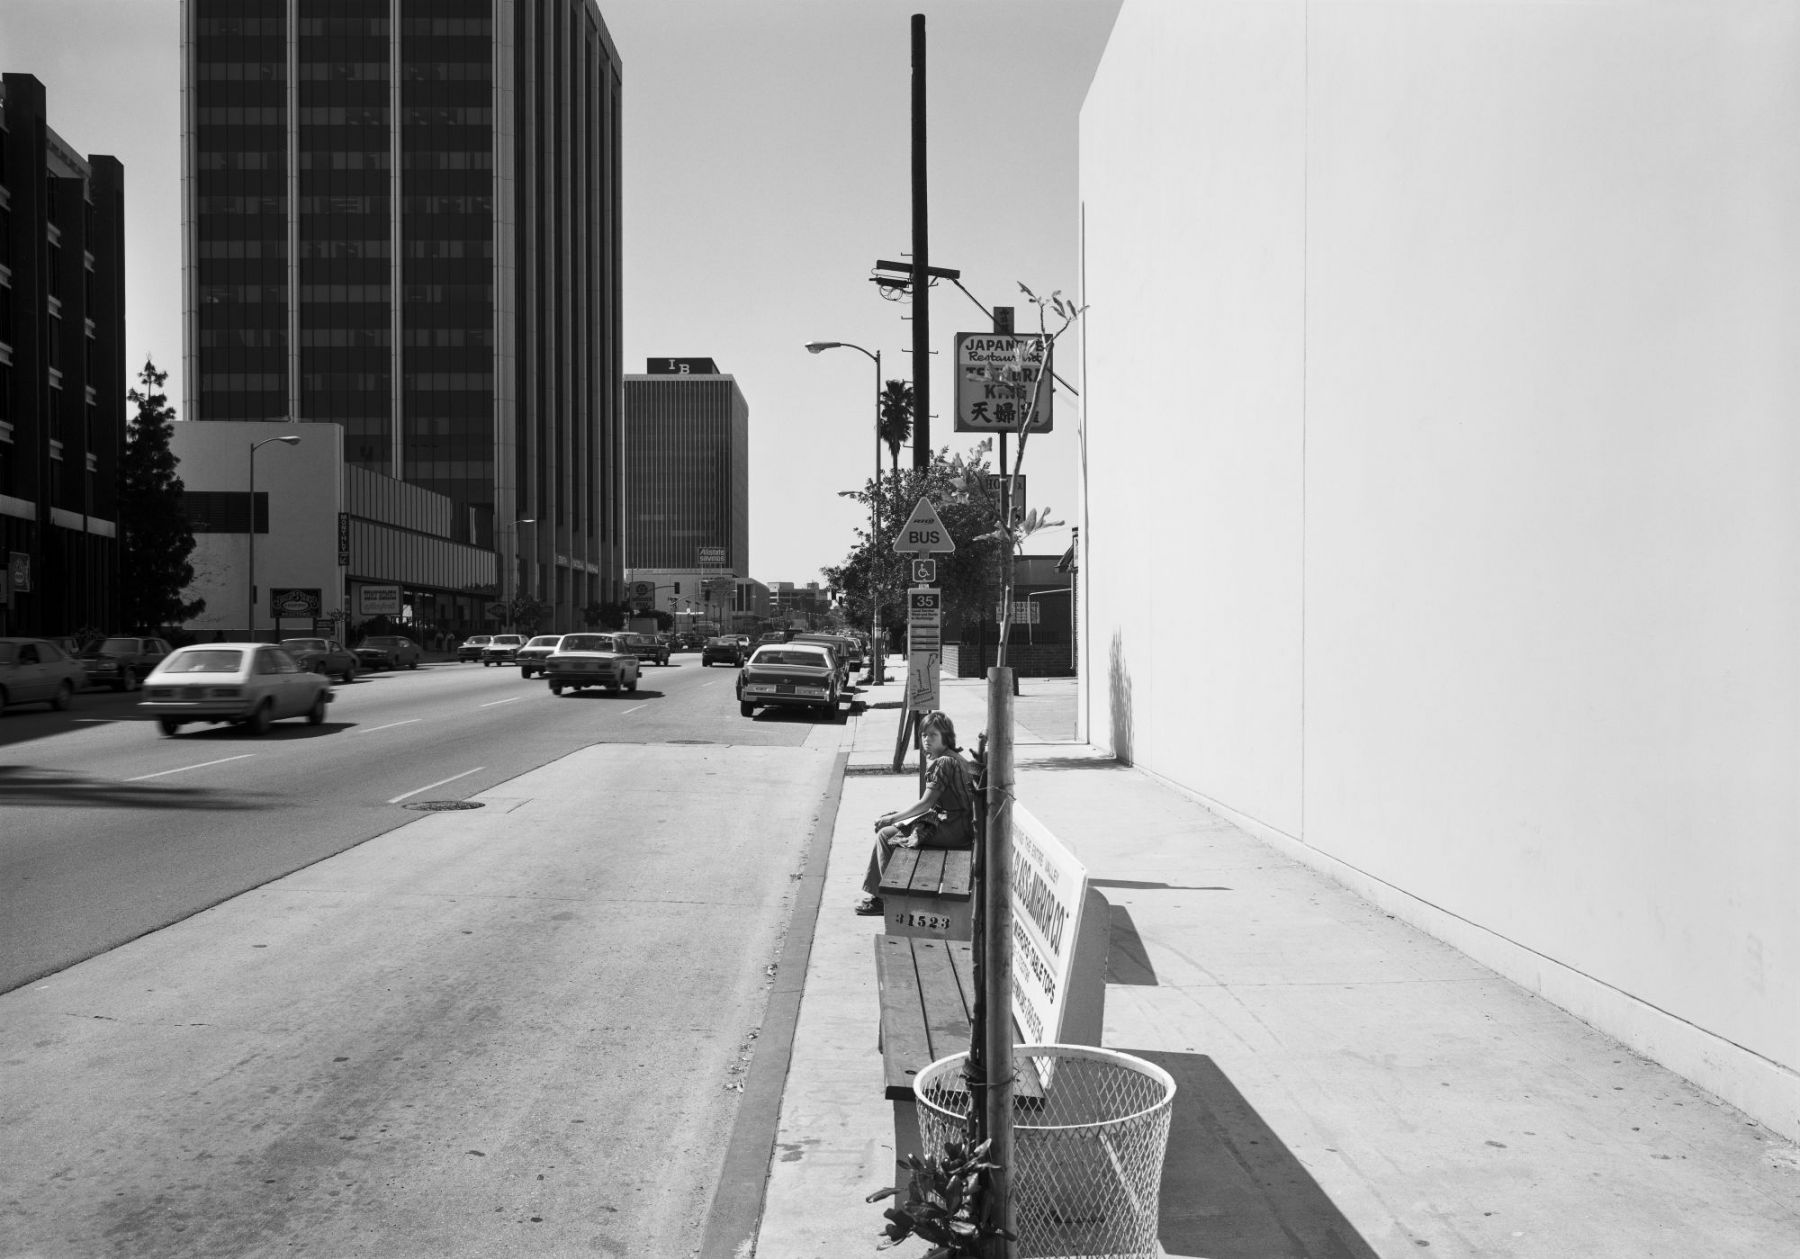 Public Transit Areas #12,1979, 28x 40 inches, archival pigment print